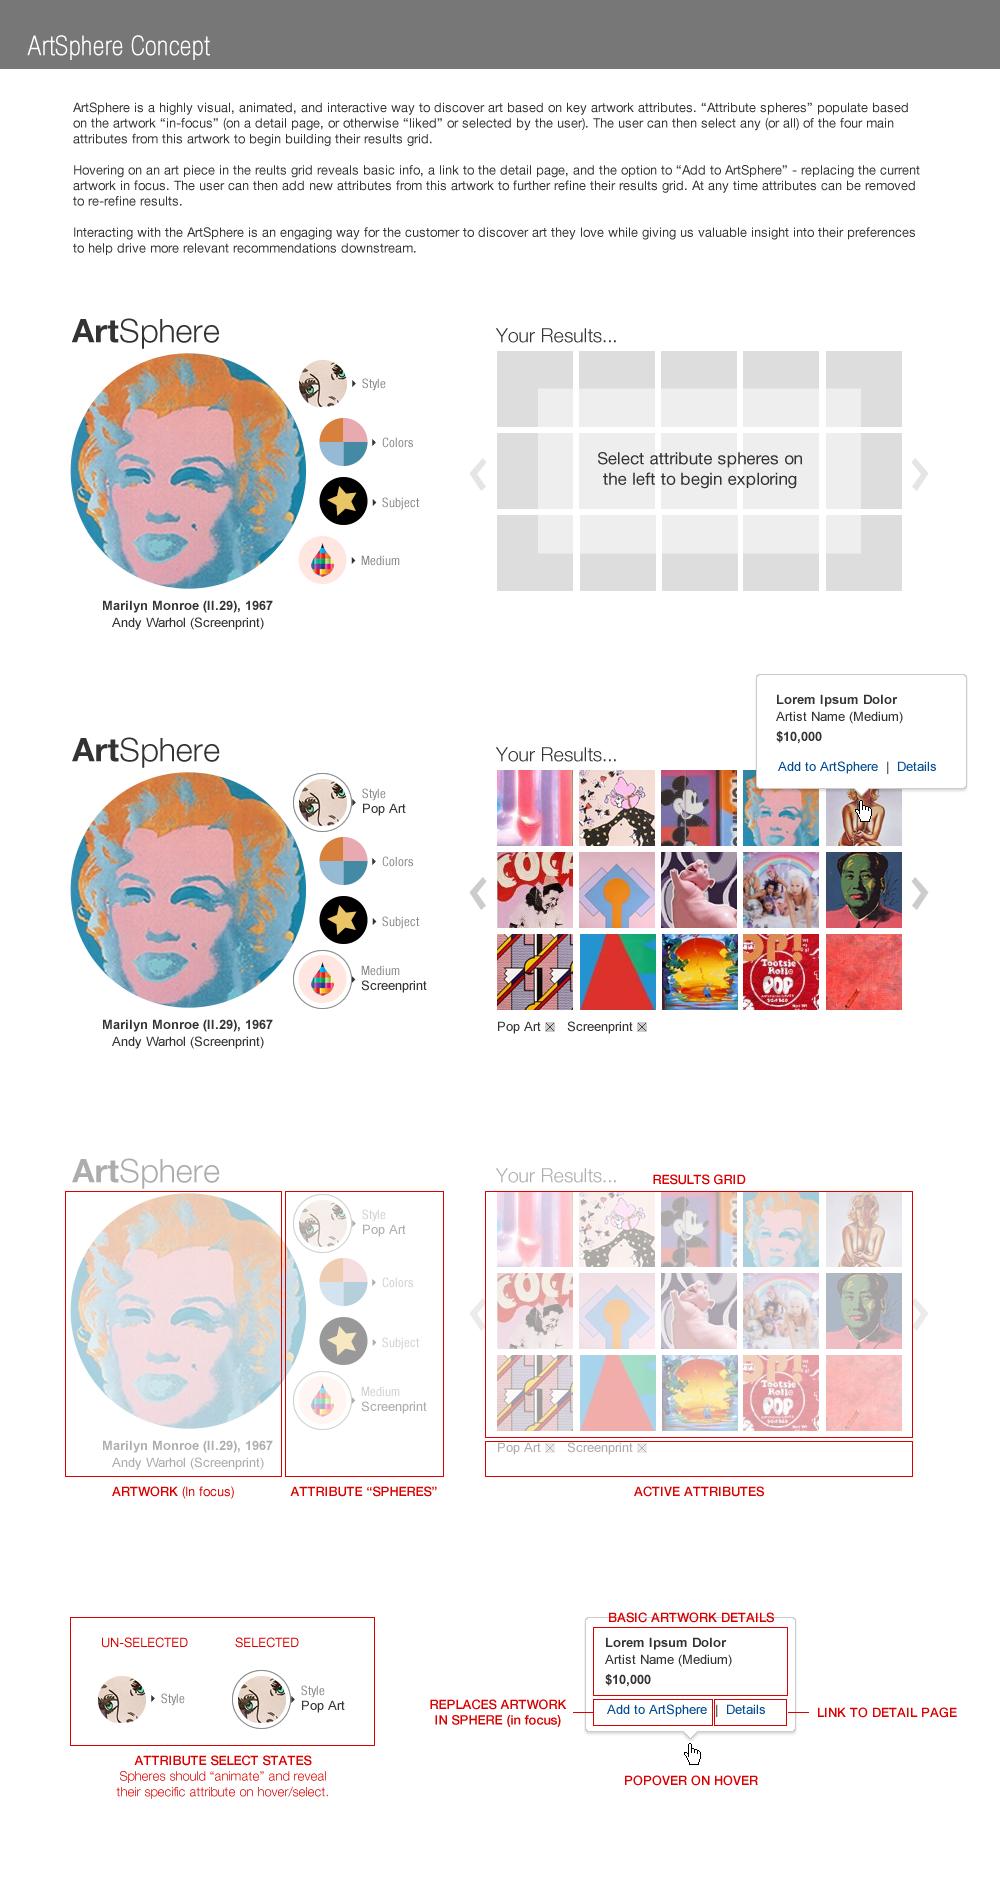 ArtSphere Visualizer Concept